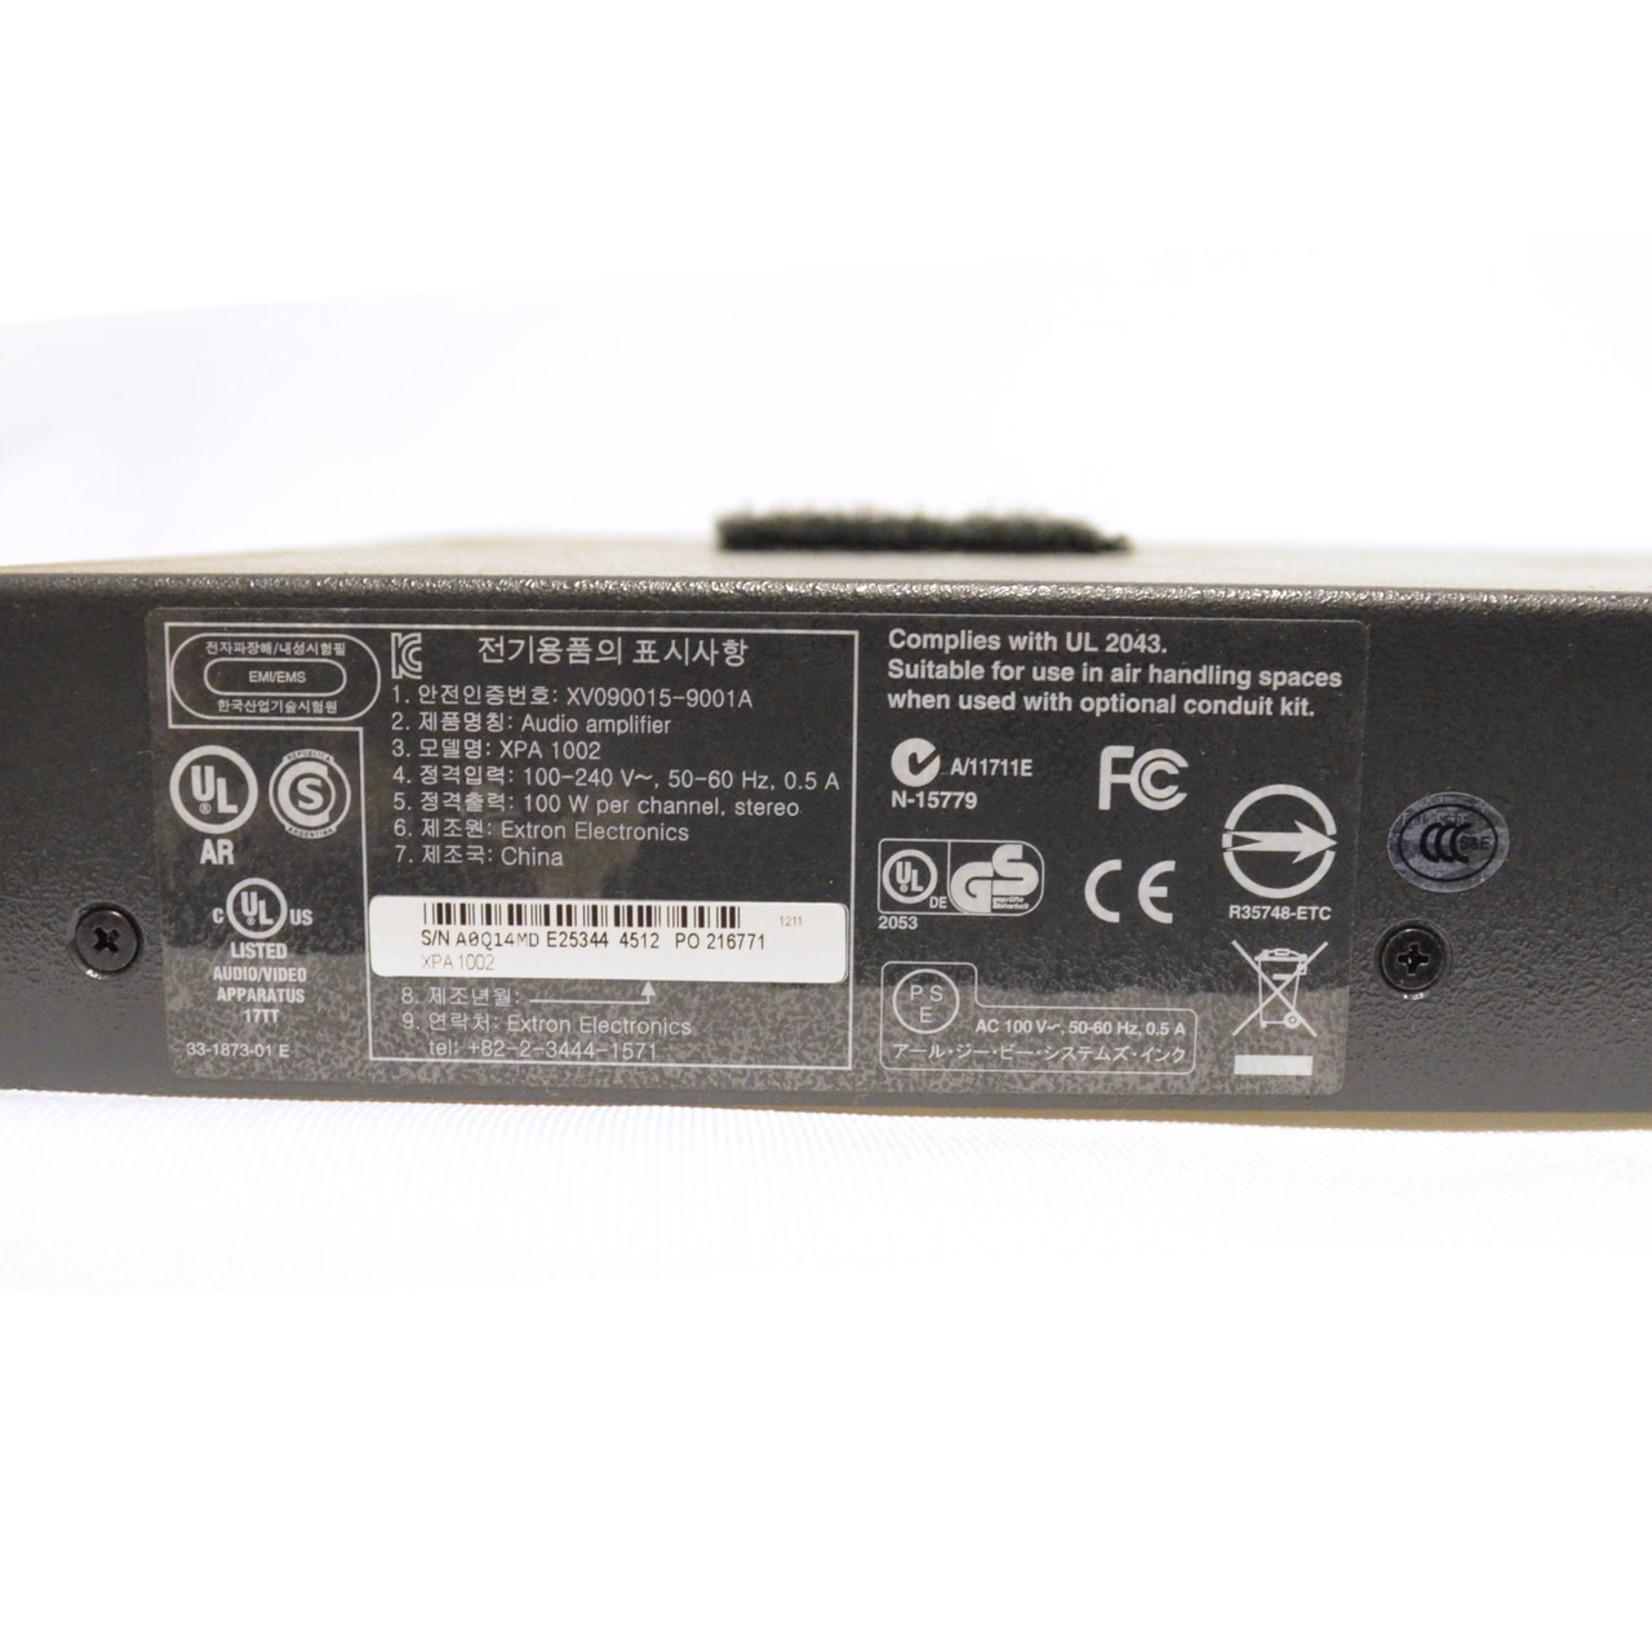 Extron XPA 1002 Power Amplifier